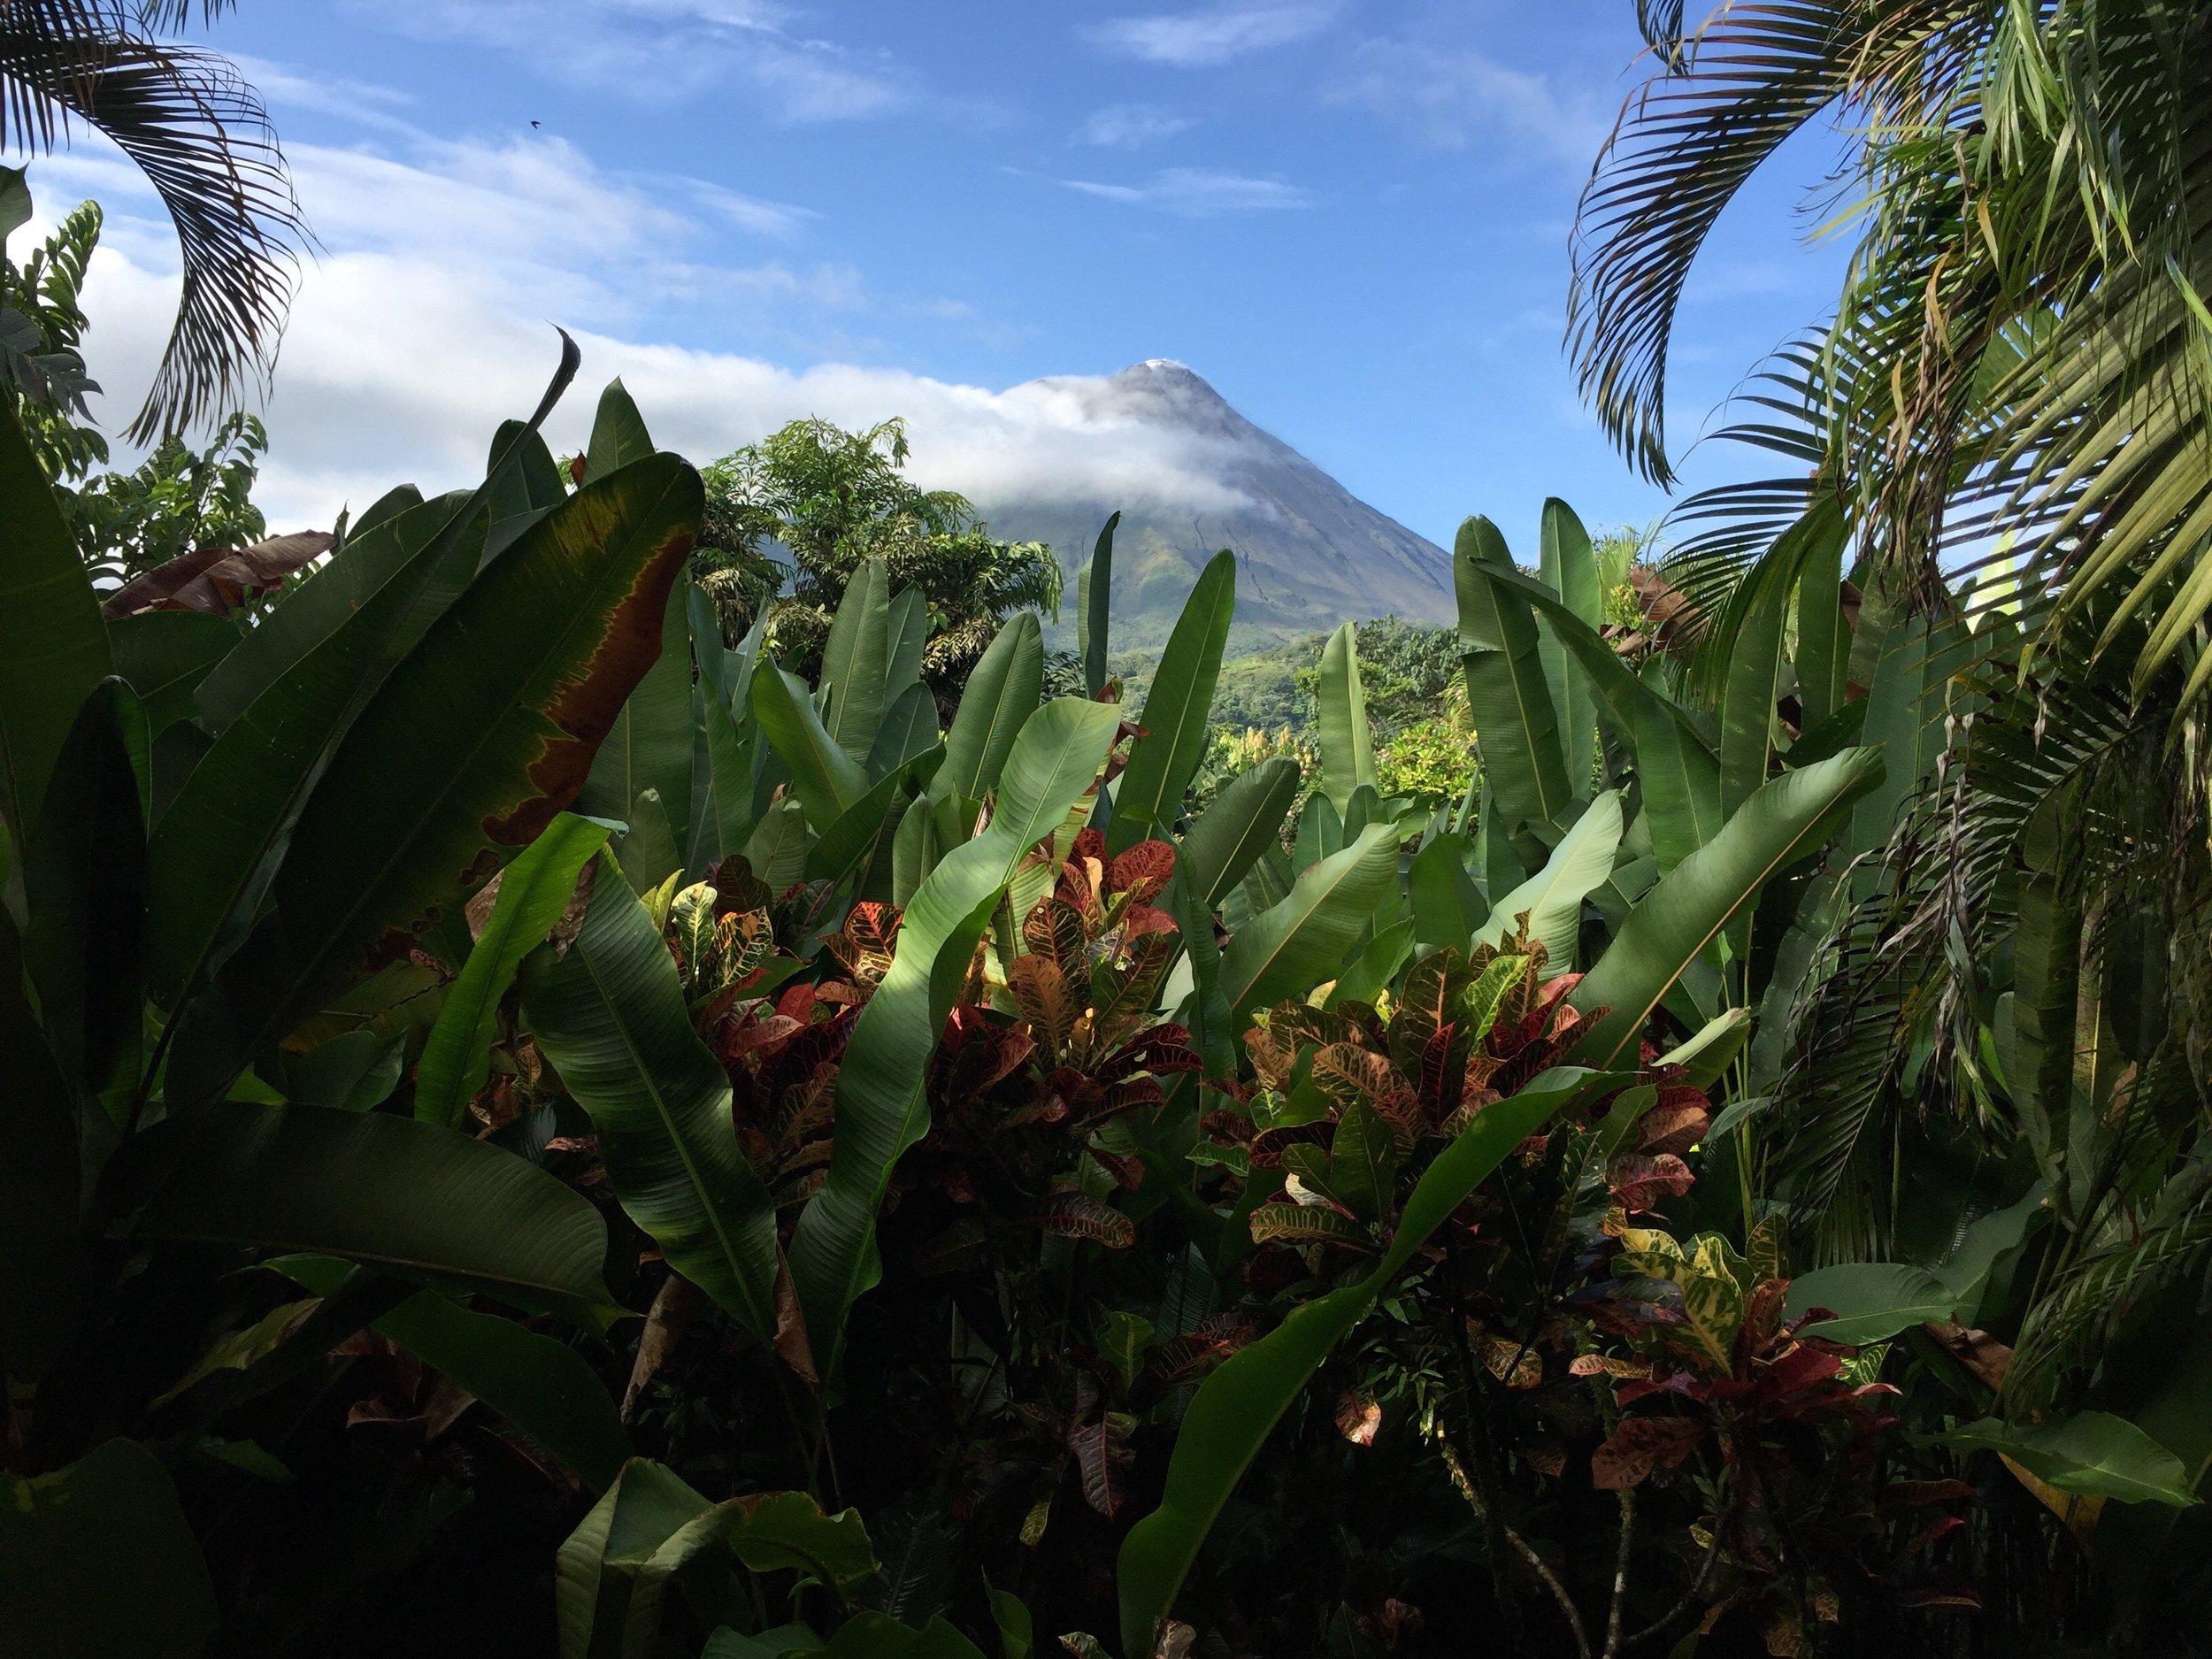 Nayara Hotel, Arenal Volcano, Costa Rica   Helena Alyssa